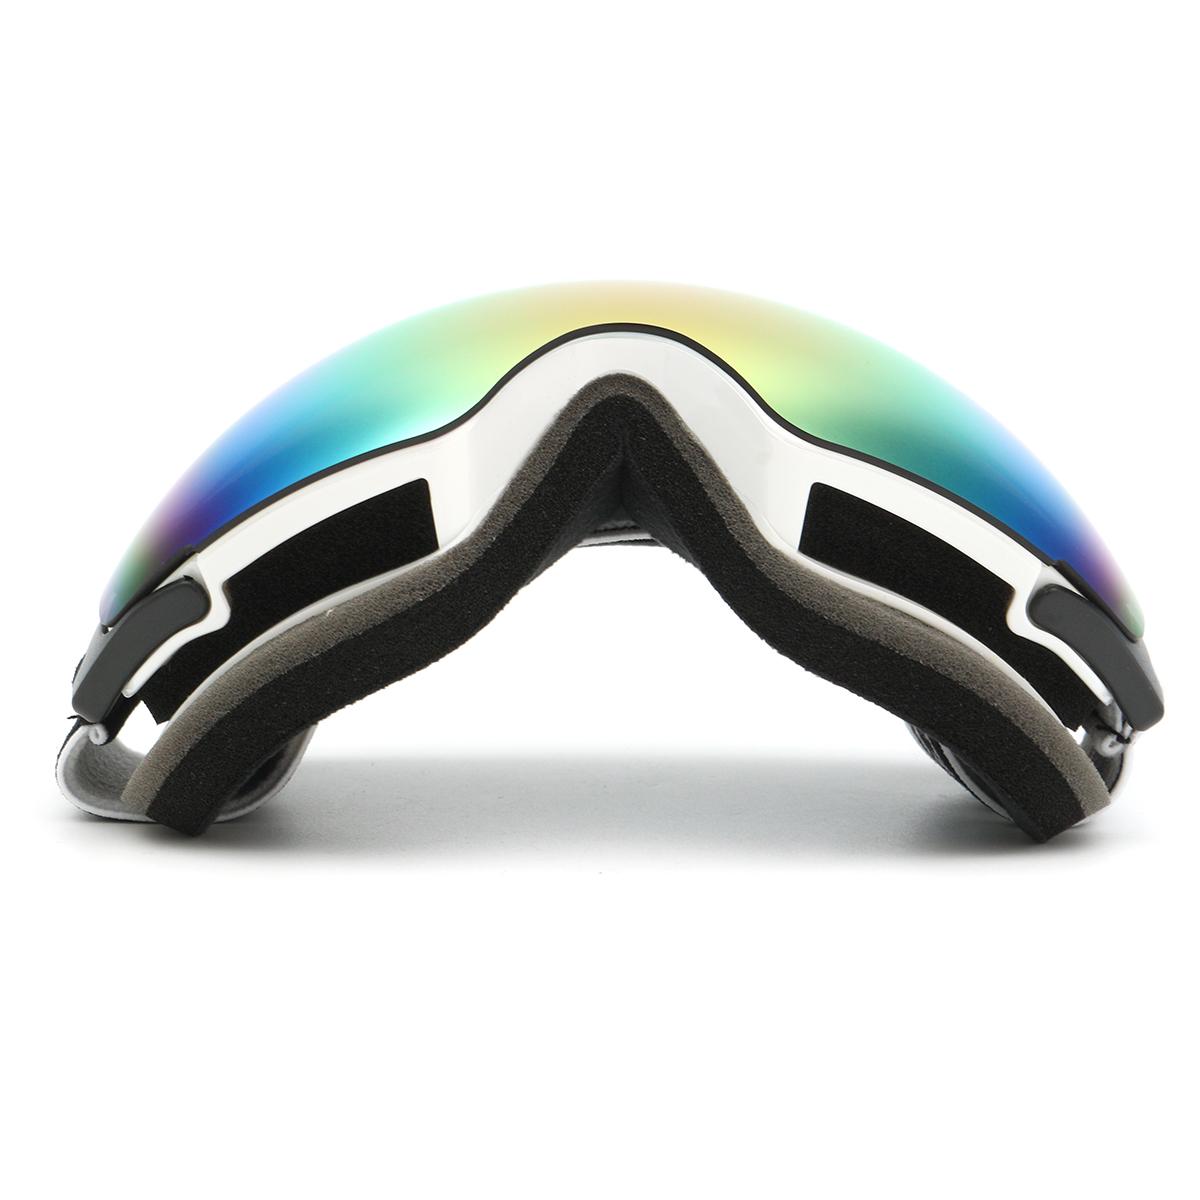 Double Lens Snowboard Ski Goggles Magnet UV Protection Anti Fog White Frame